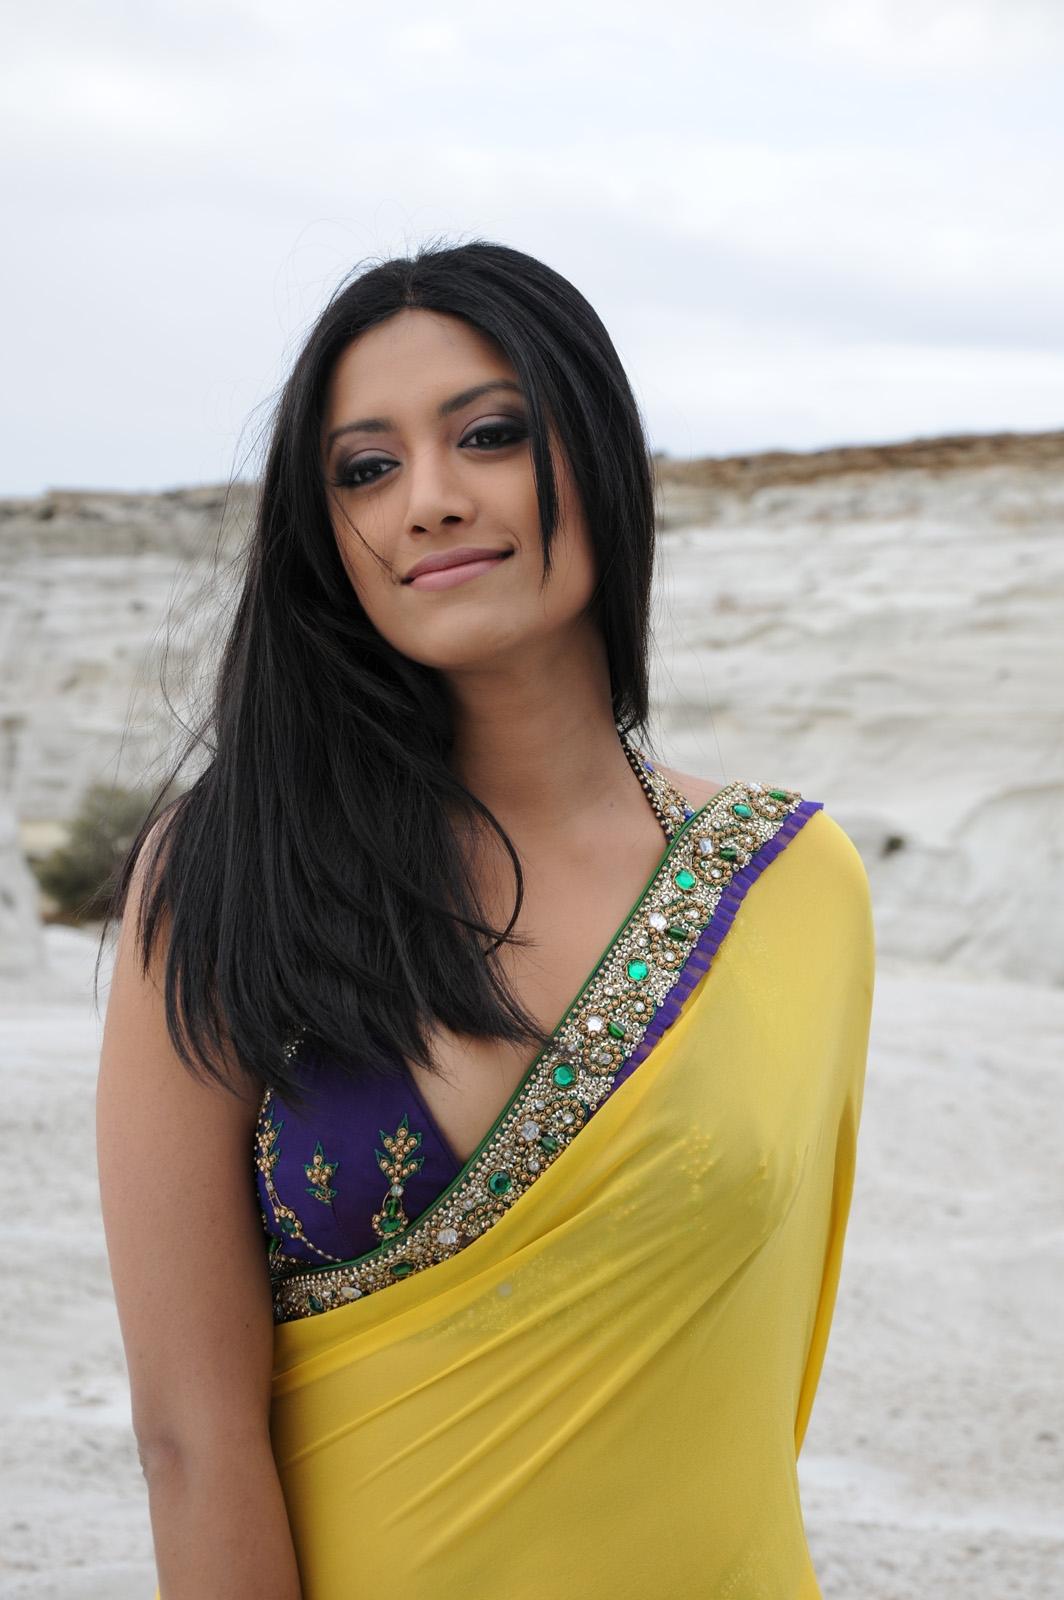 Mamta mohandas in yellow saree from kedi